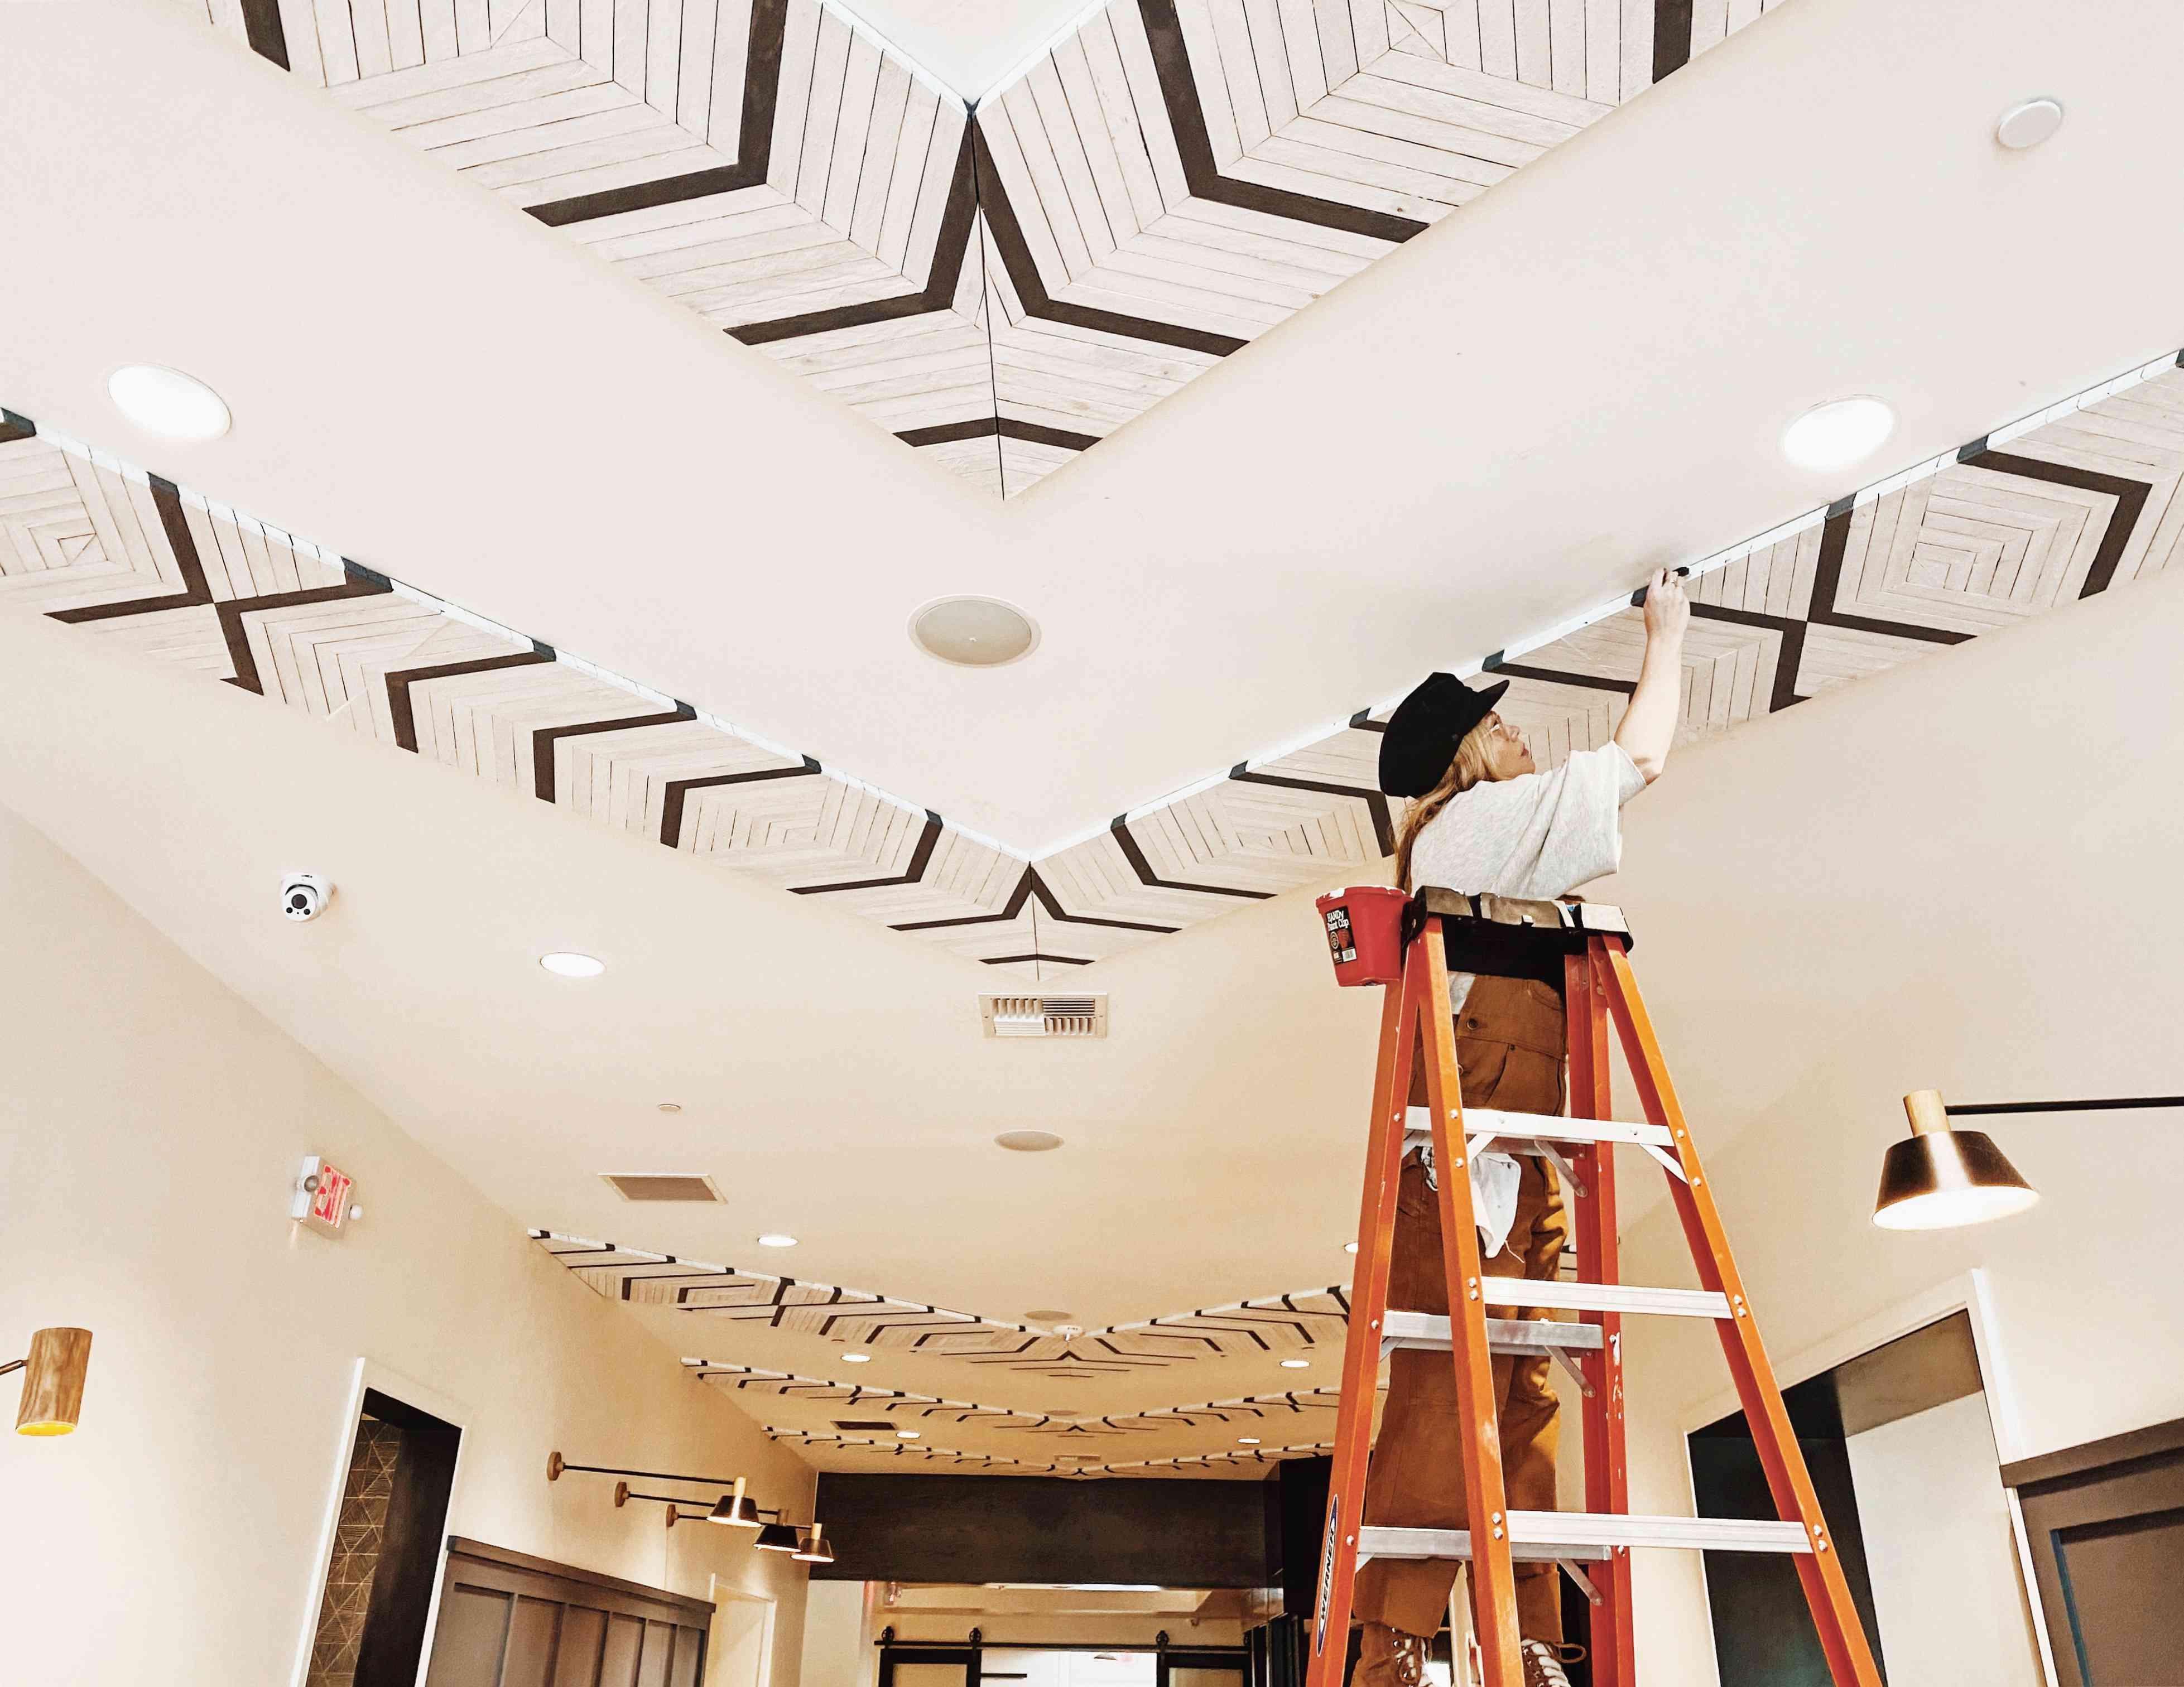 Aleksandra Zee works on a ceiling installation in Sonoma, California